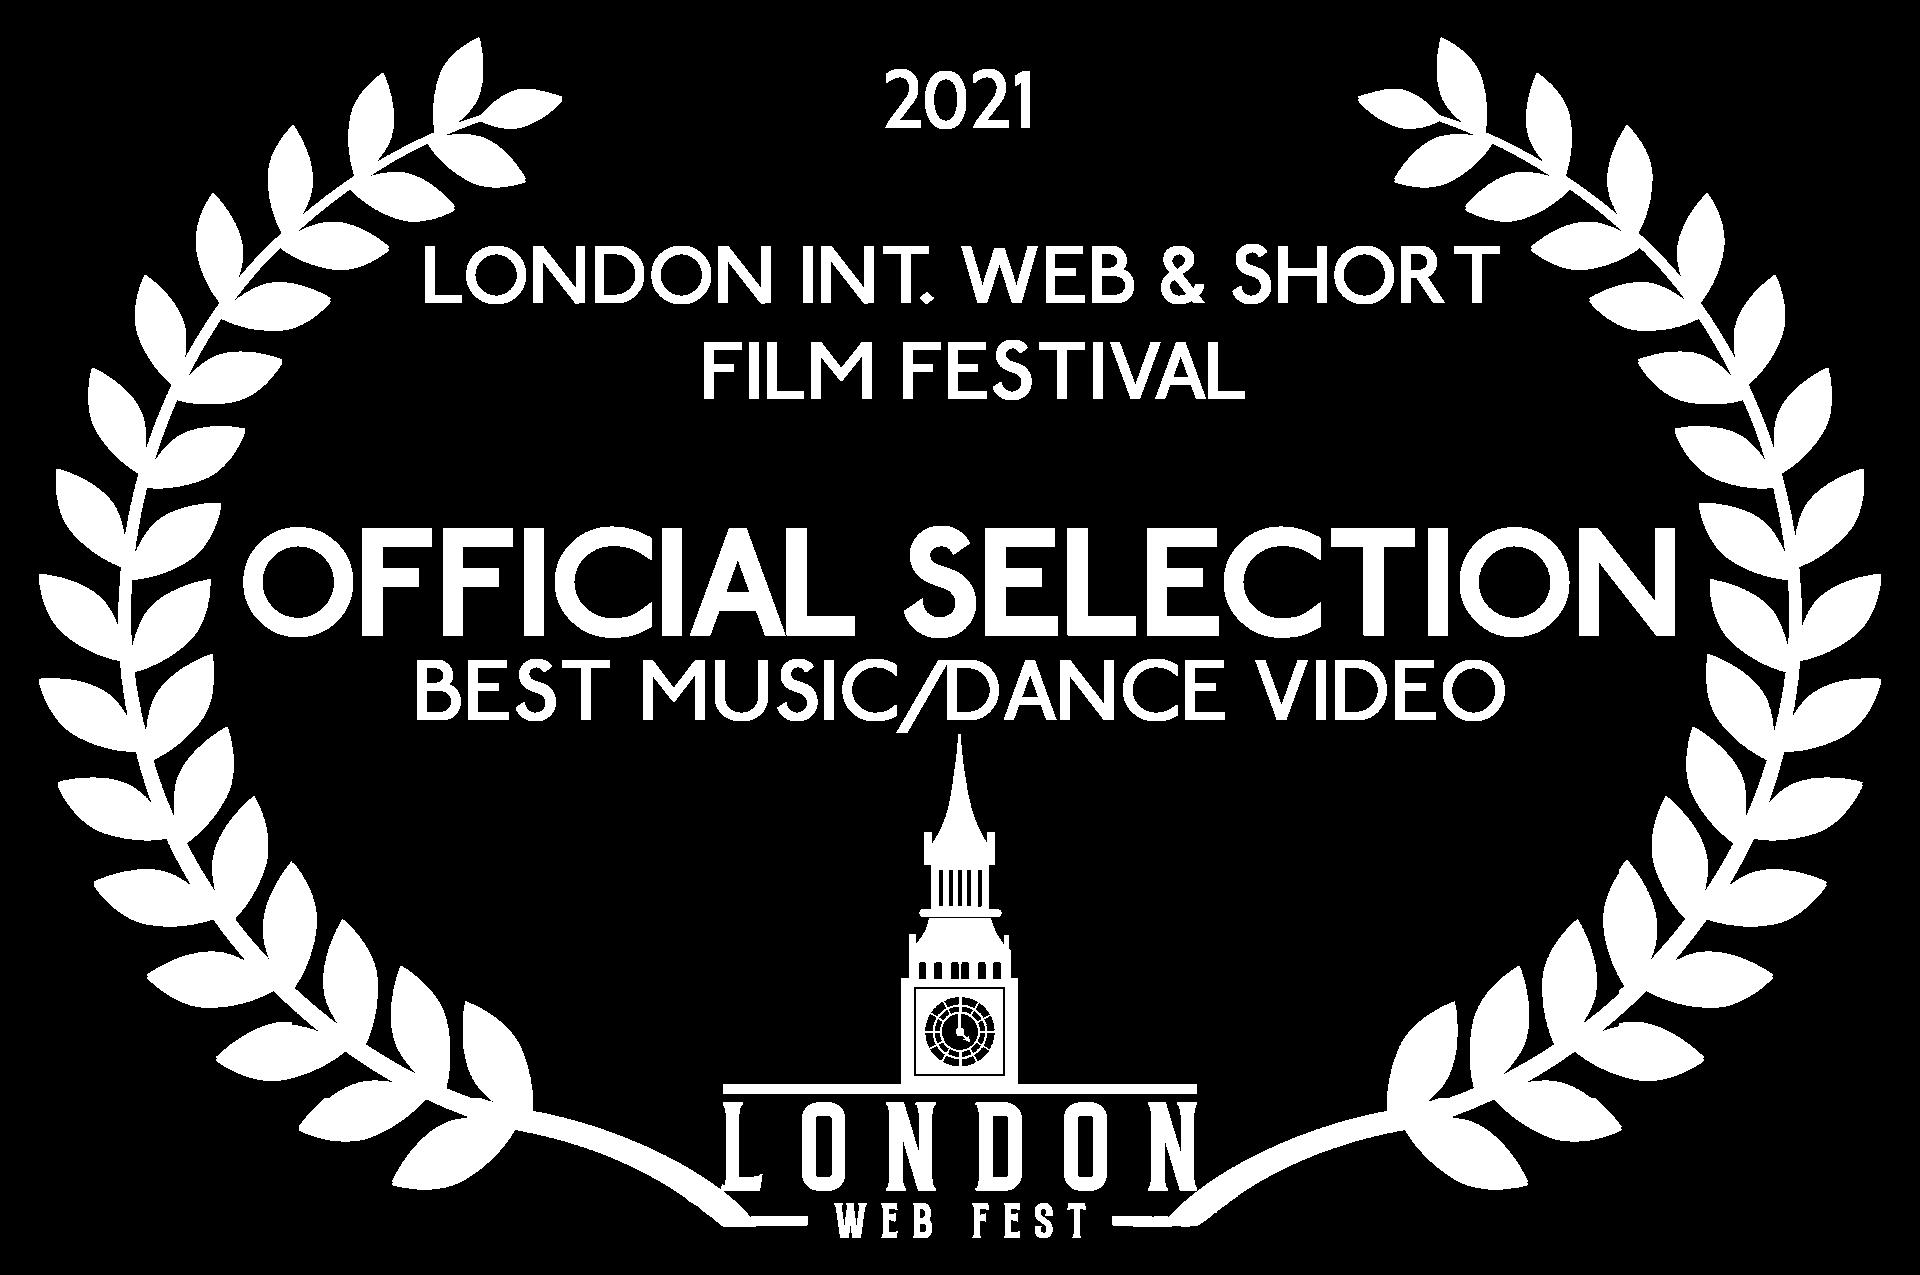 LONDON INTERNATIONAL WEB&SHORT FILM FESTIVAL